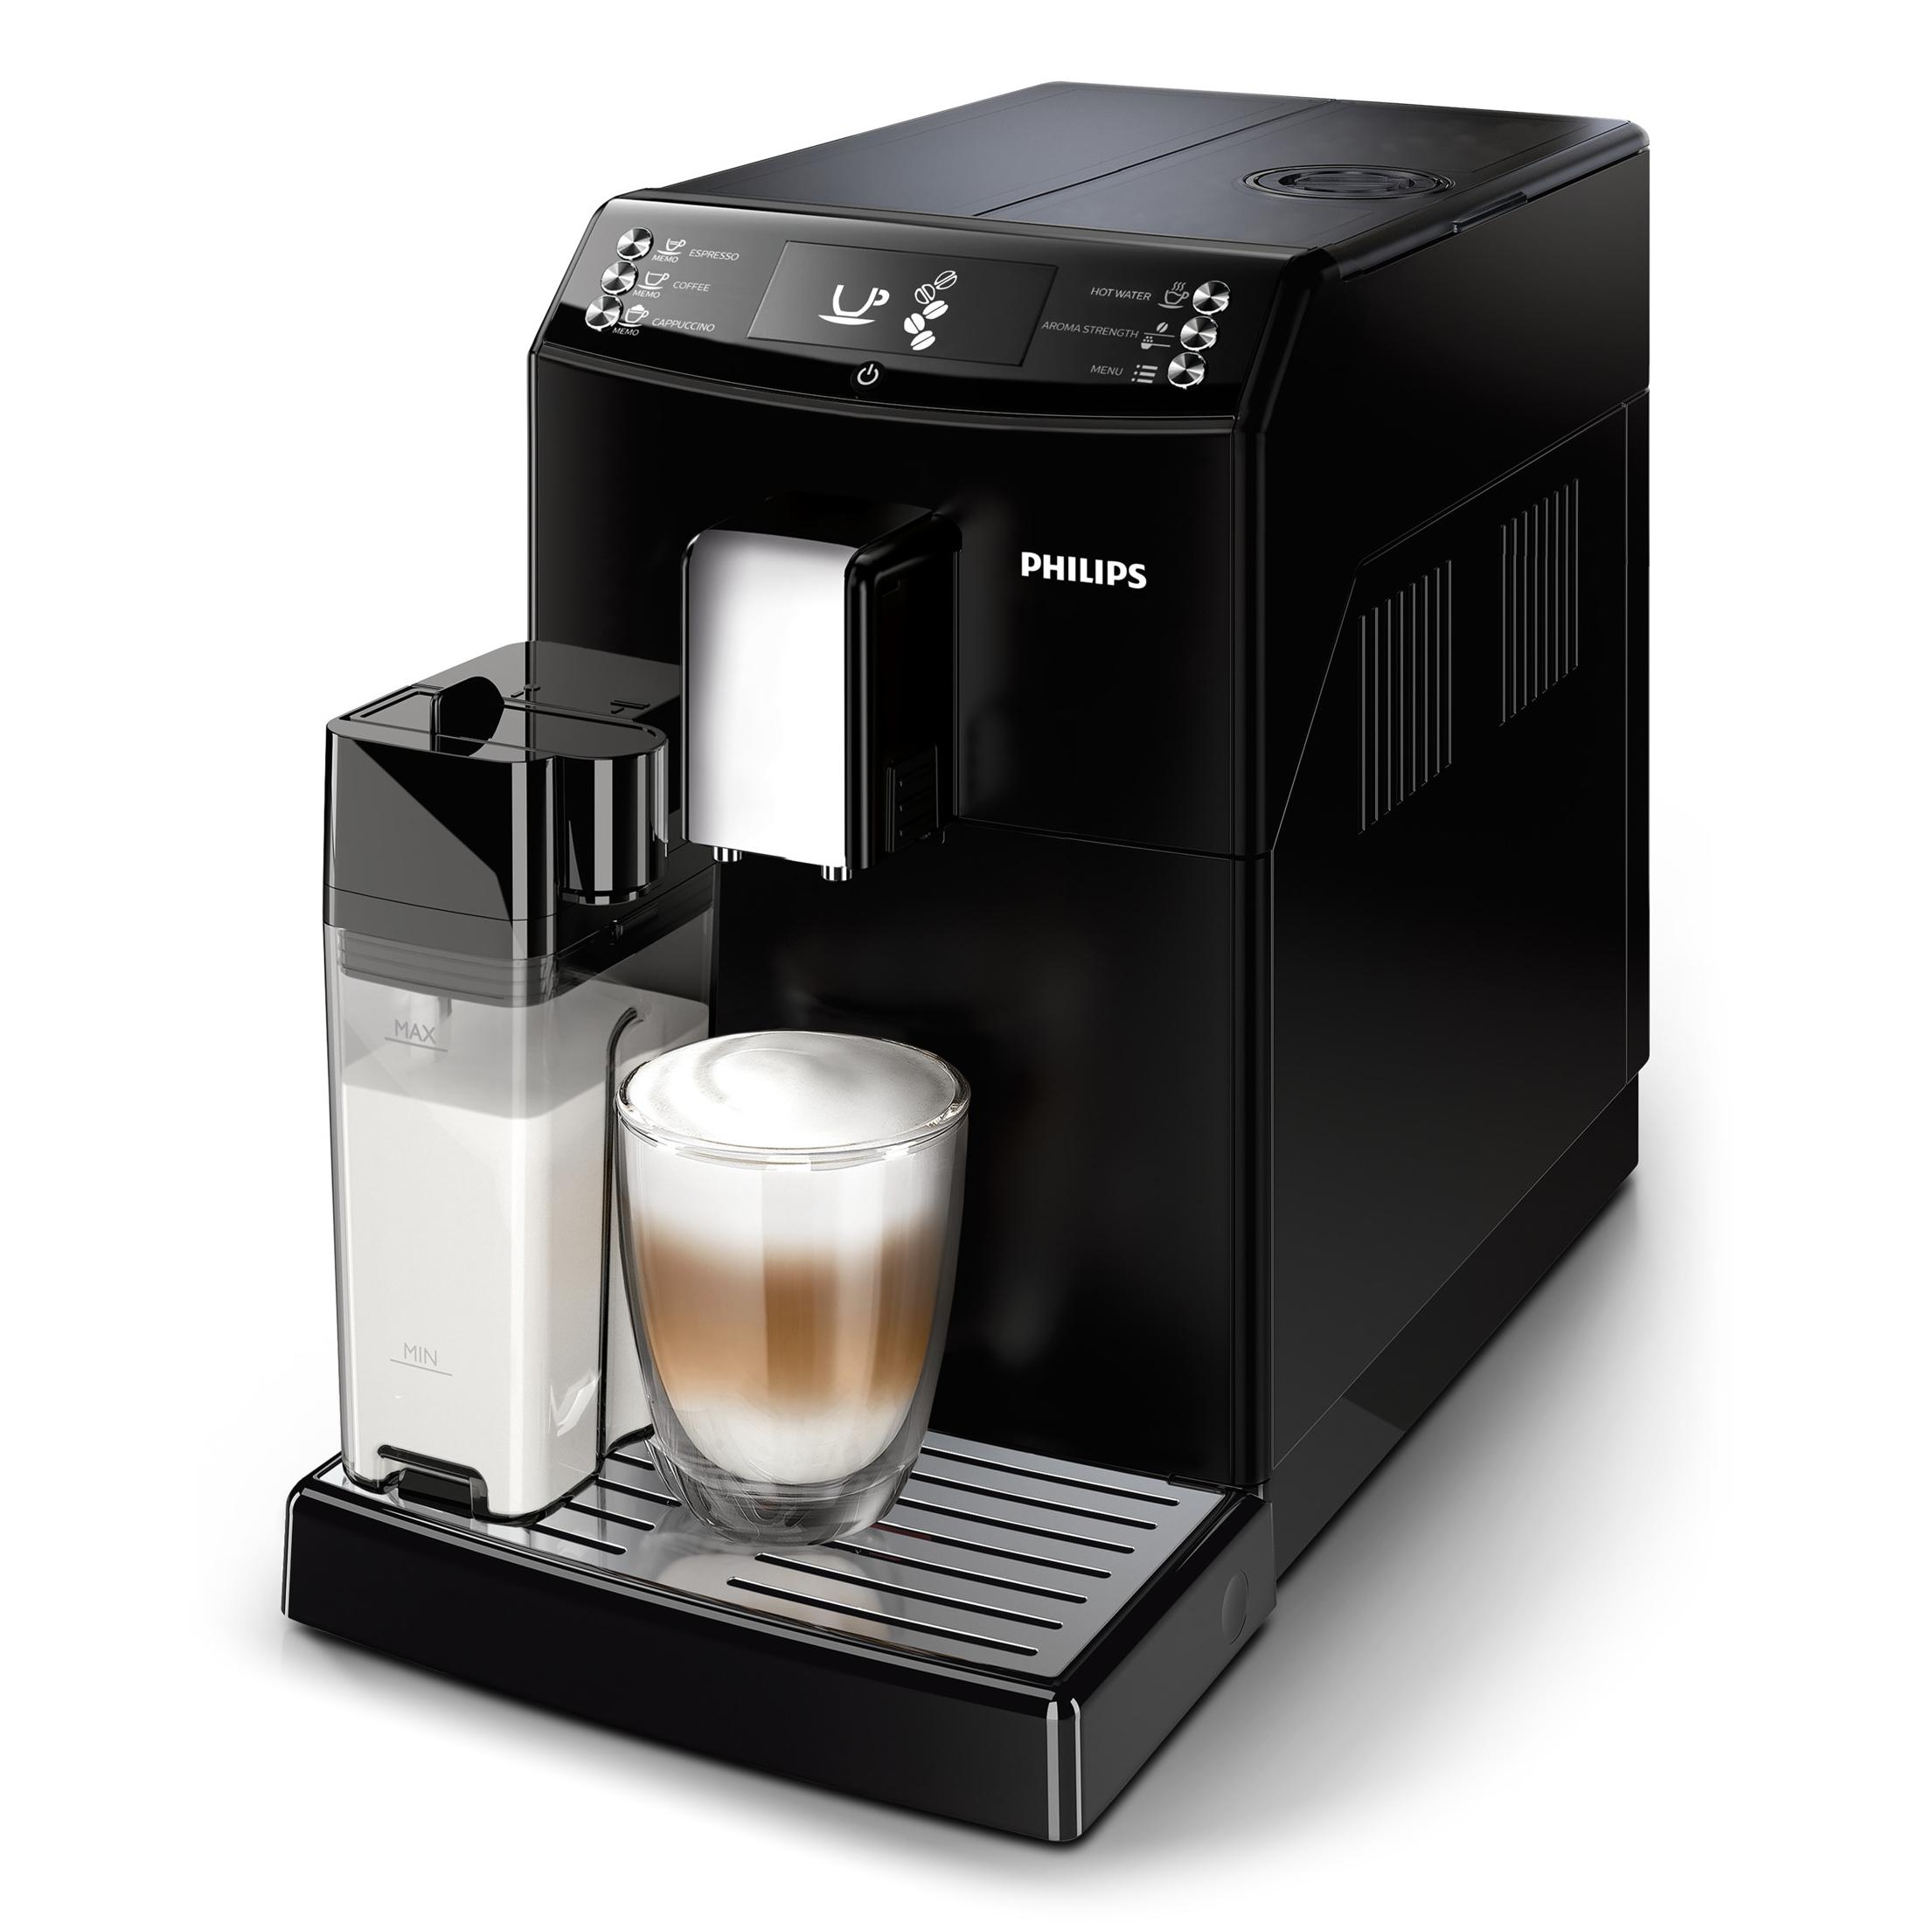 Philips Series 3100 Super Automatic Espresso Machine With